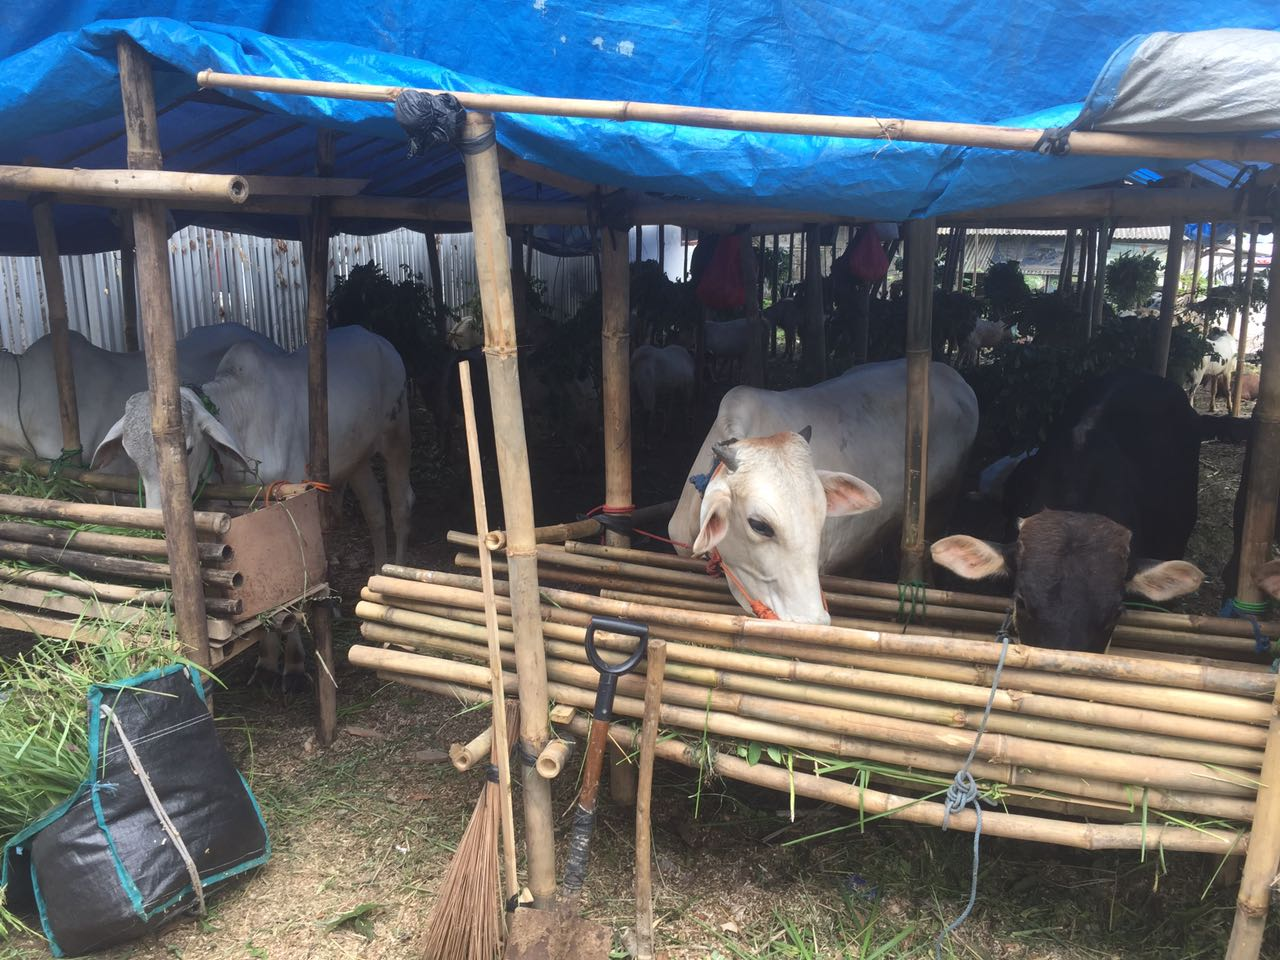 Pendirian Pasar Hewan Dorong Penguatan Ekonomi Sektor Peternakan